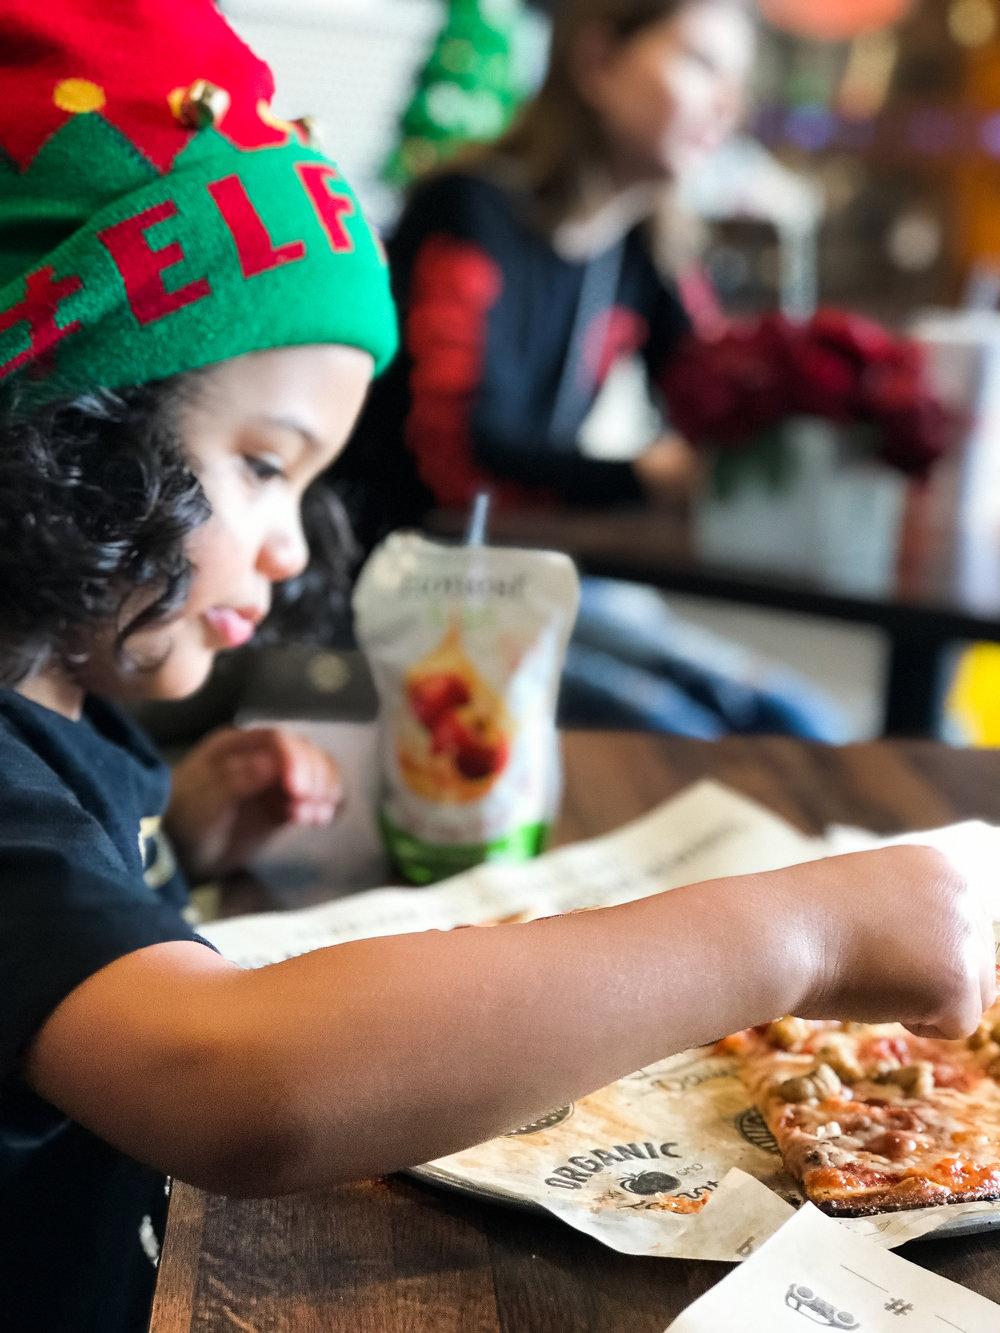 pizzarev-sacramento-pizza-cauliflowercrust.jpg